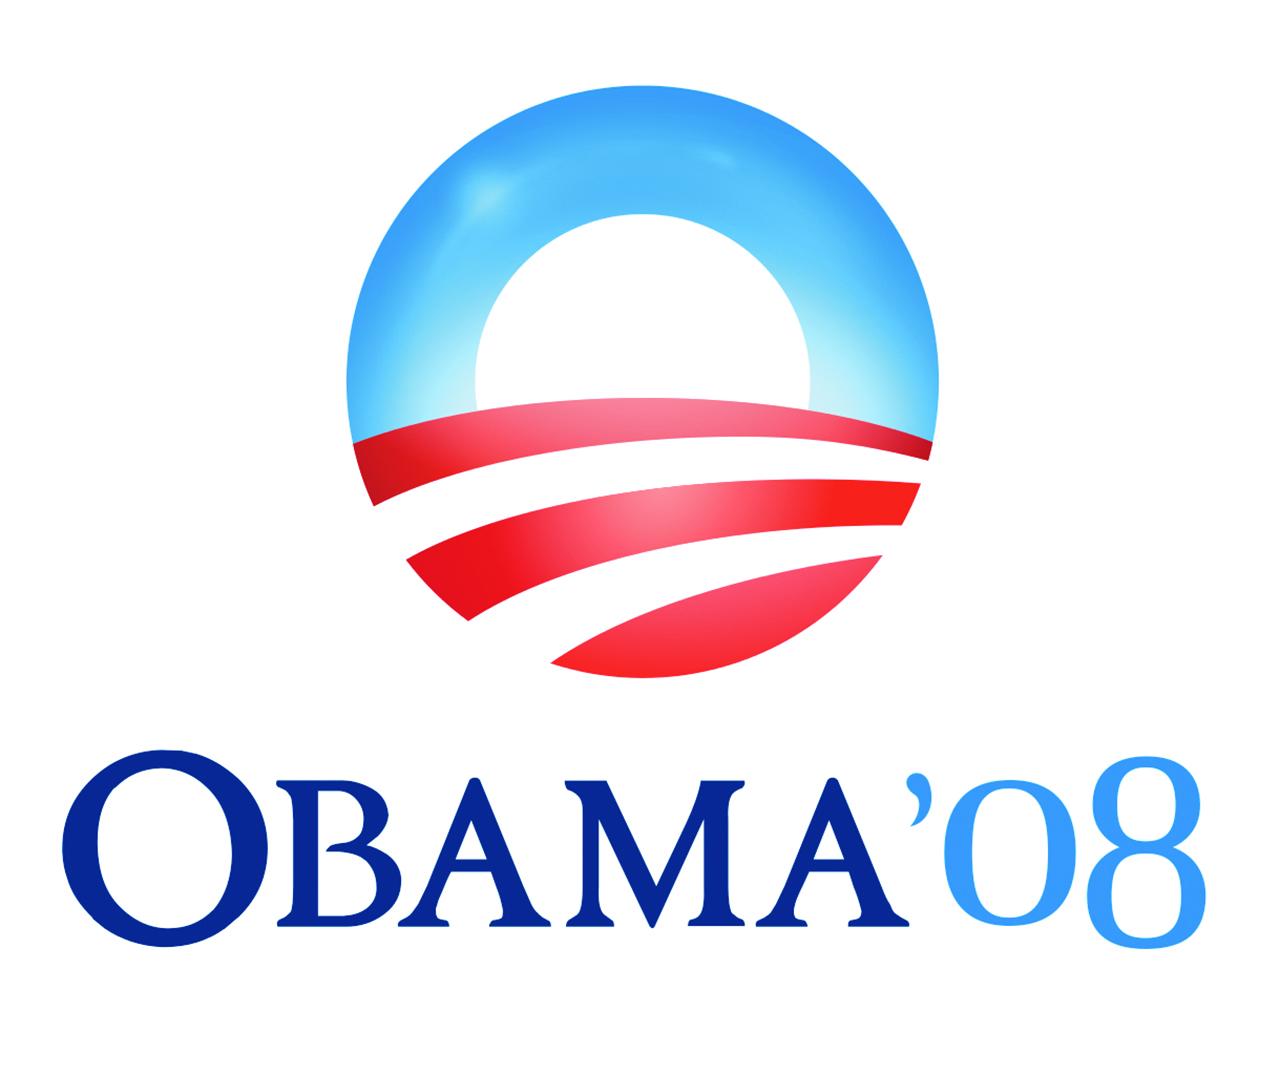 President Barack Obama's 2008 sunrise logo